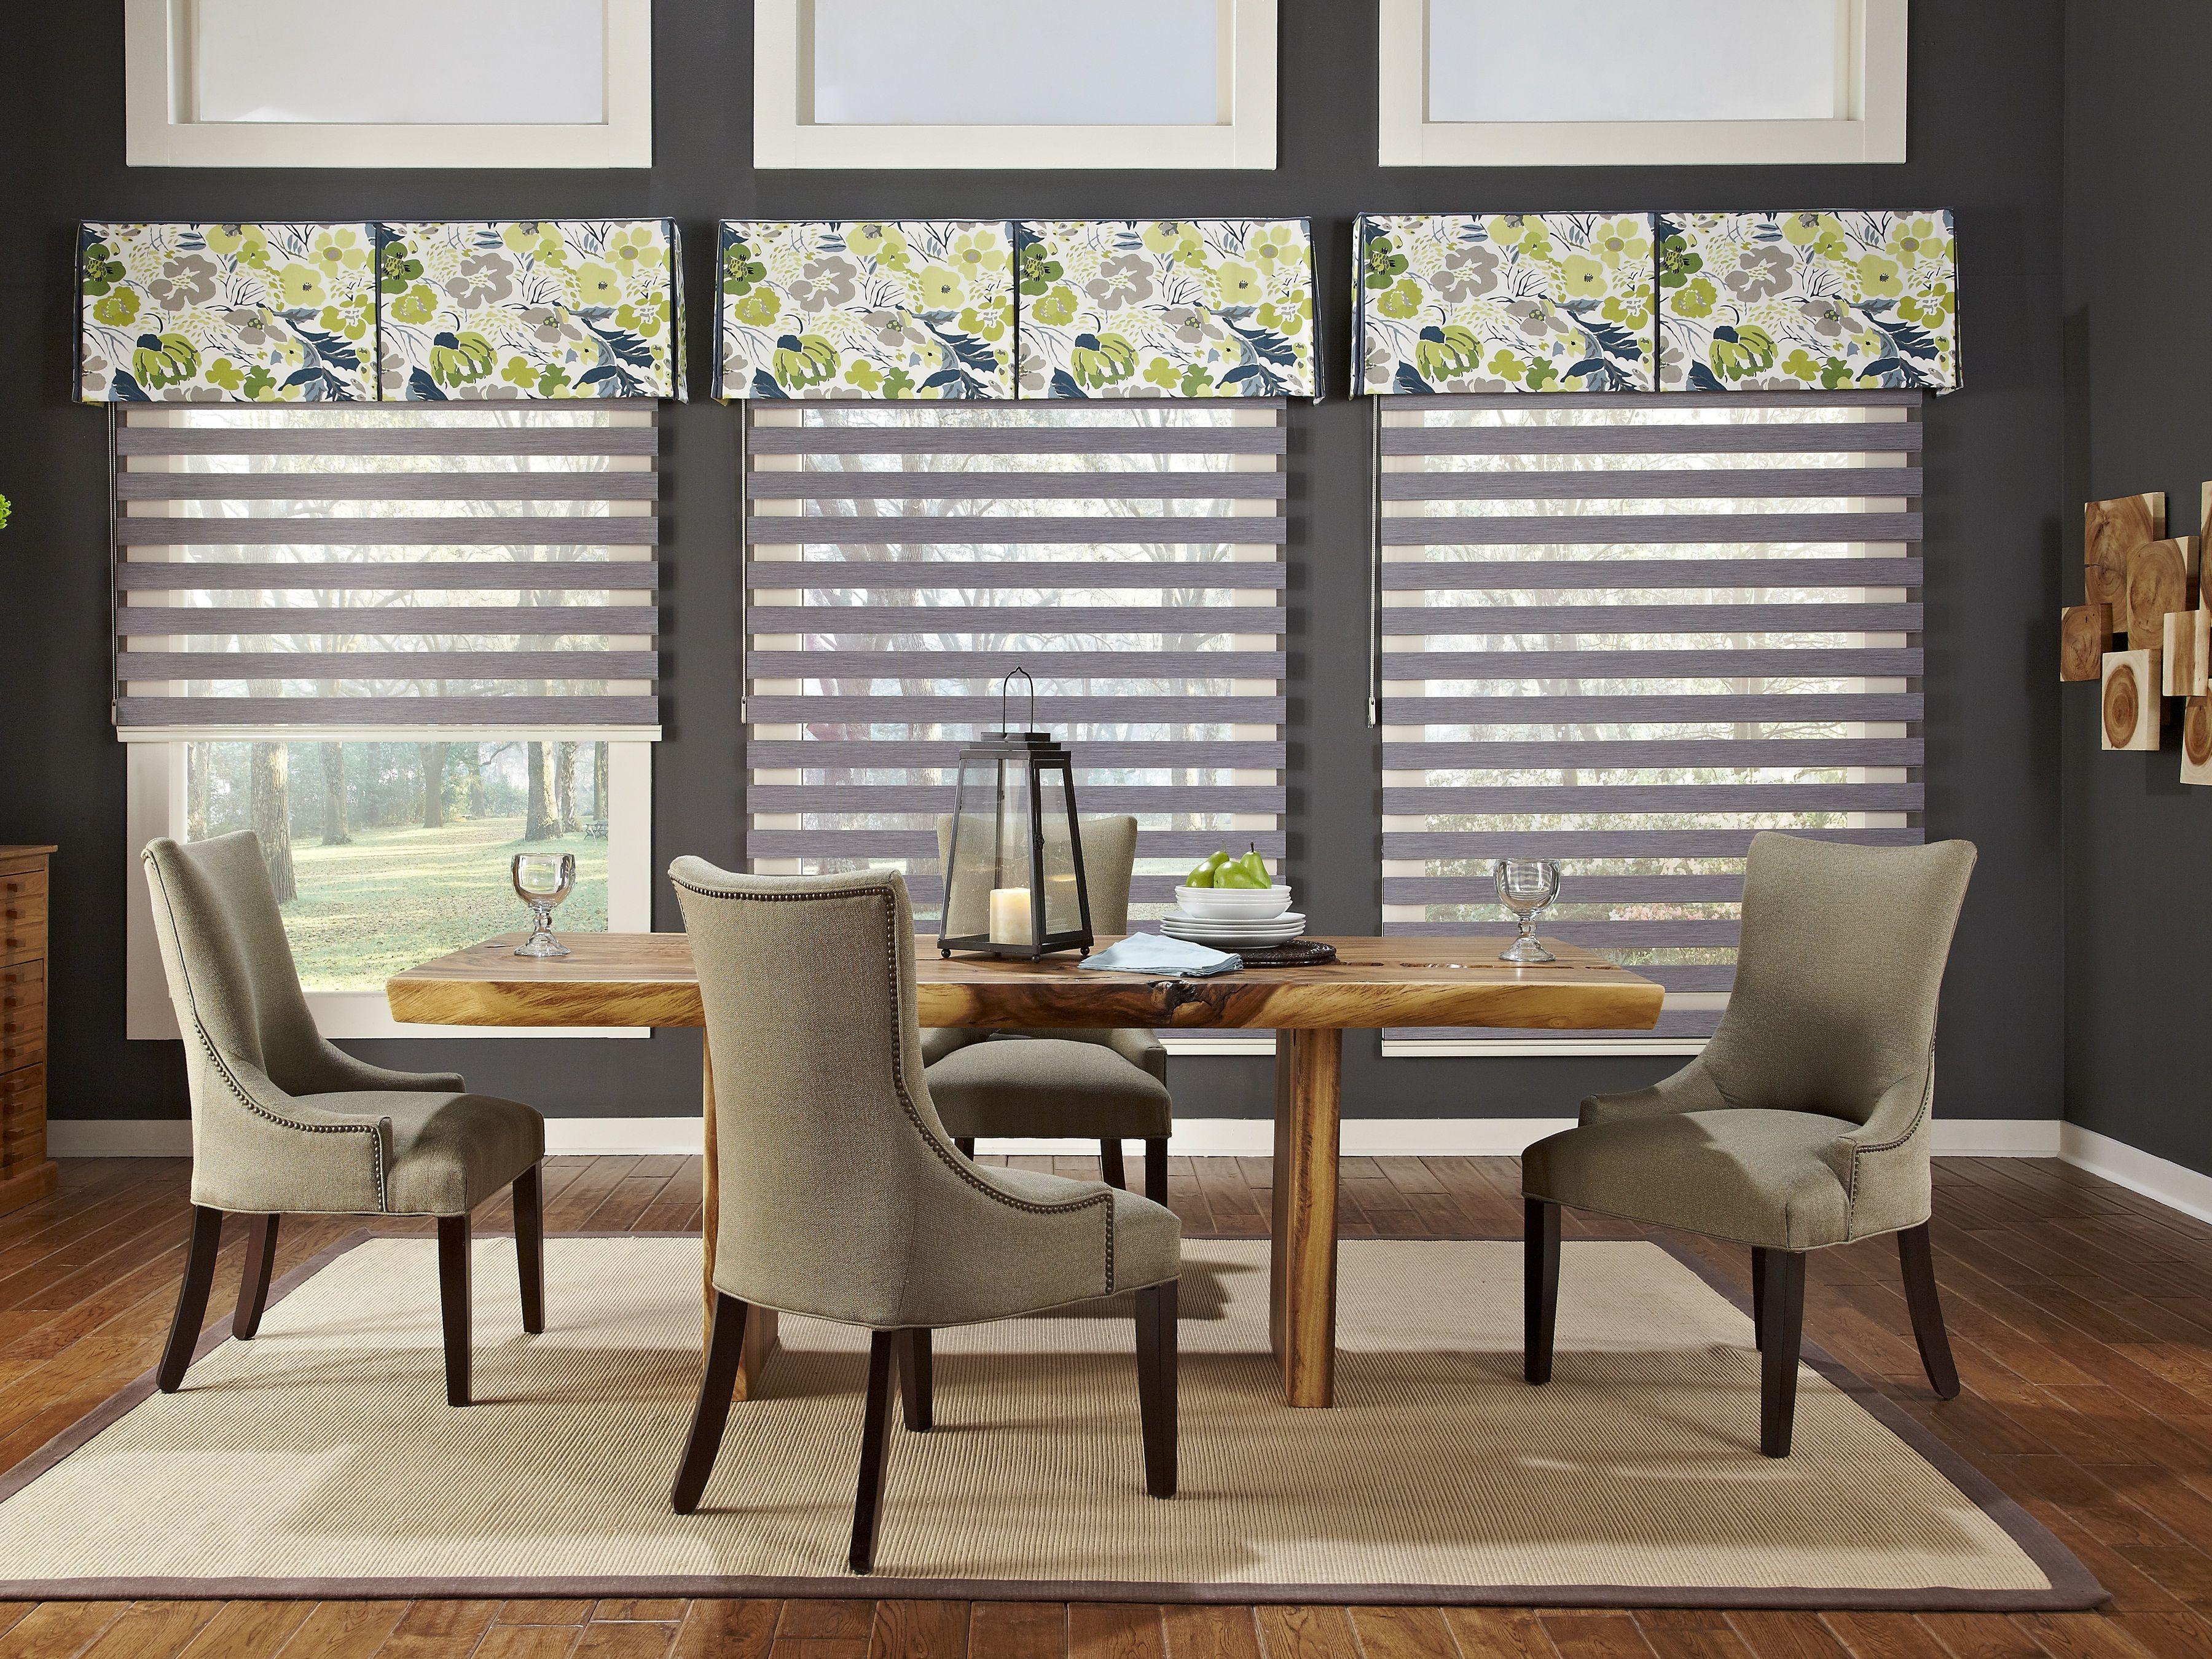 Window Treatments for Dining Room Ideas - HomesFeed on Dining Room Curtains Ideas  id=14670